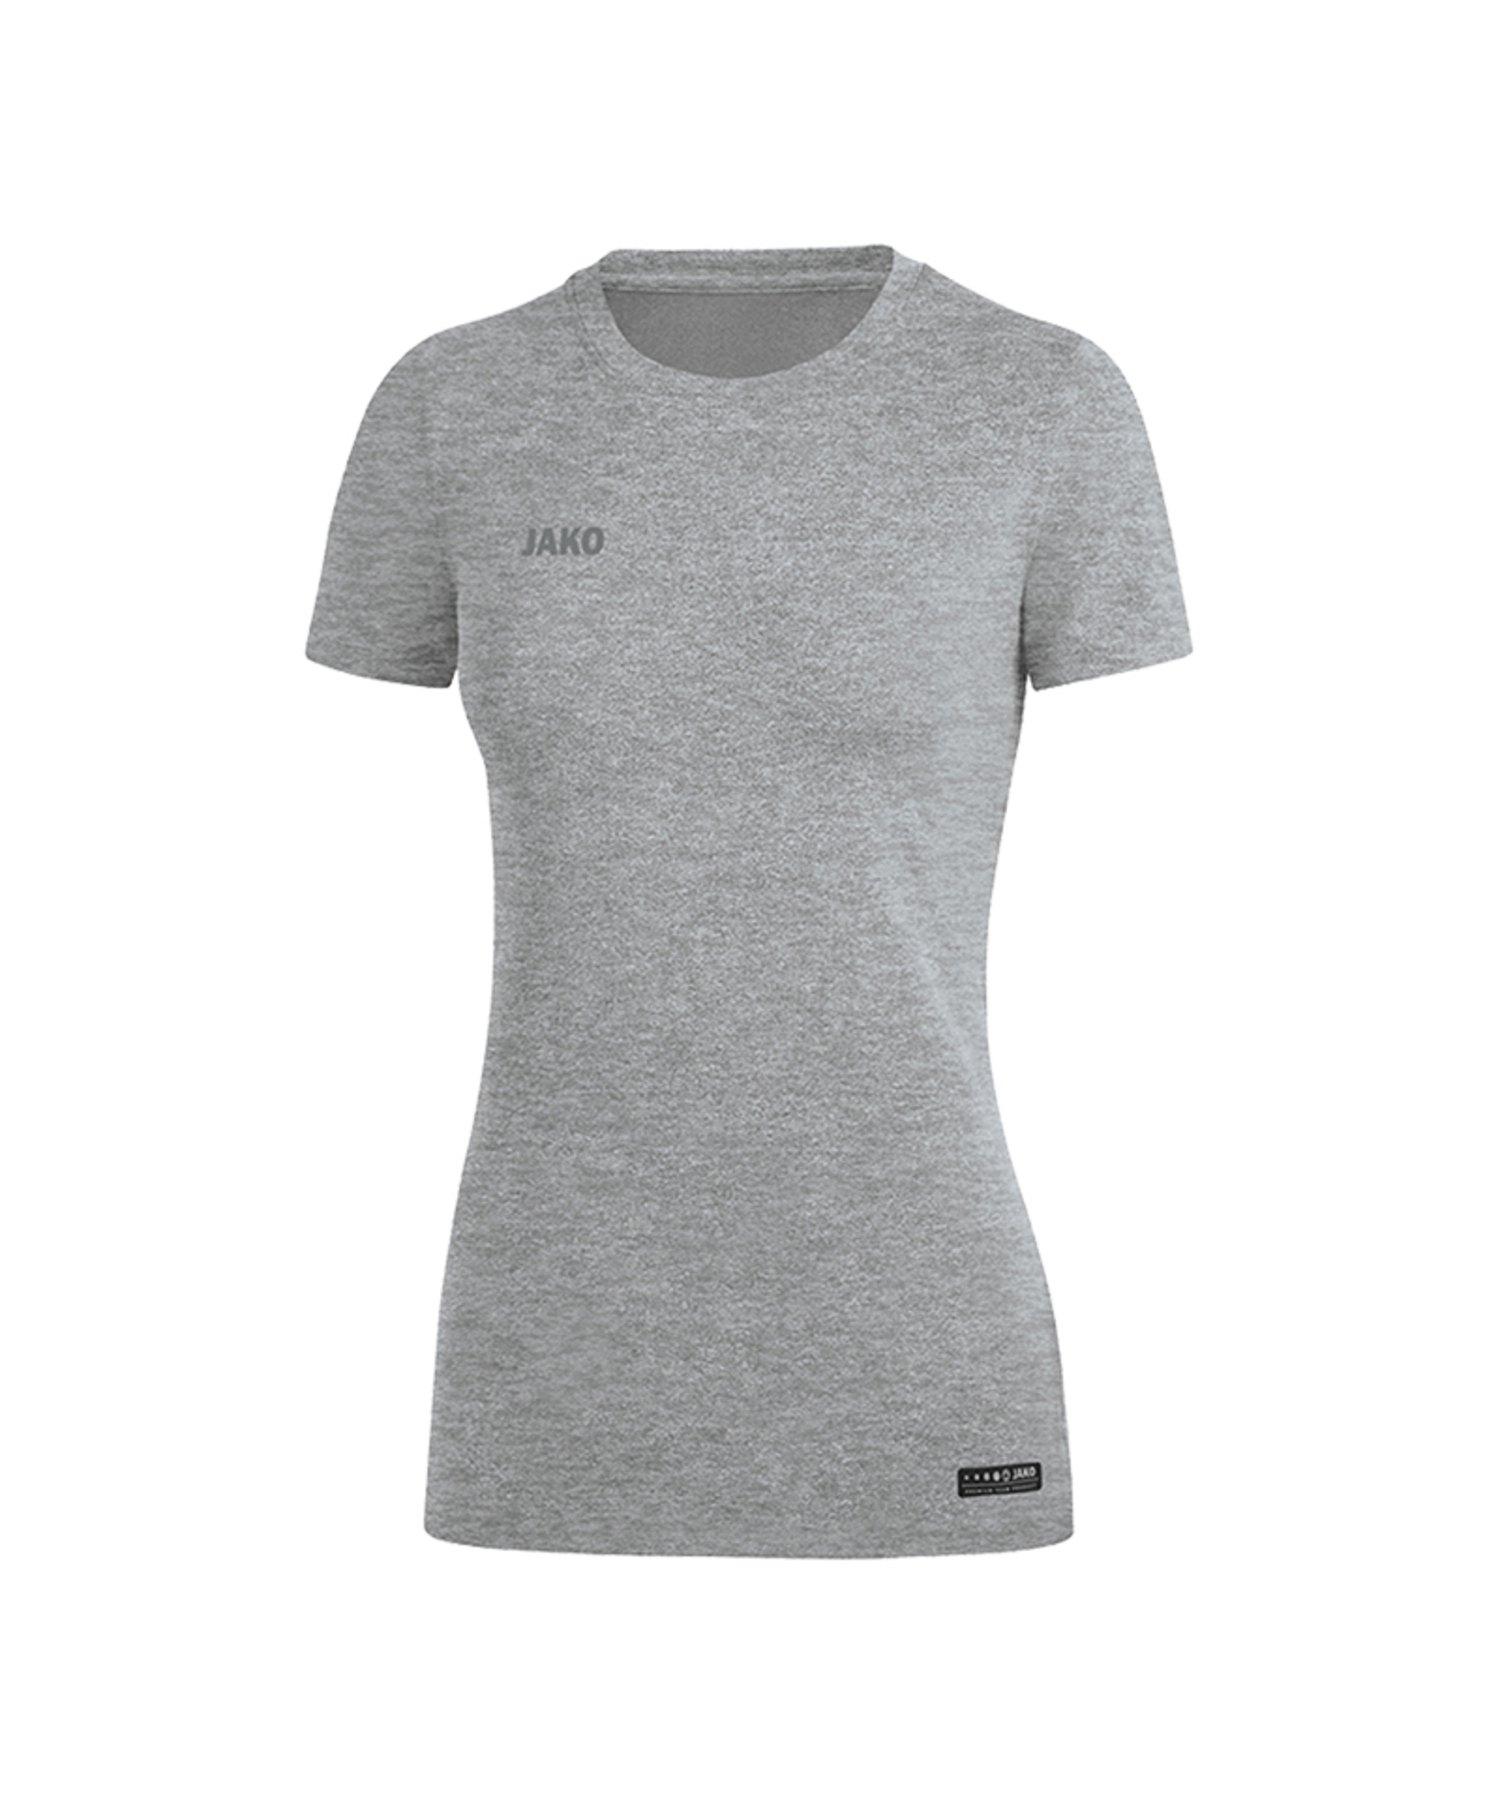 Jako T-Shirt Premium Basic Damen Grau F40 - Grau